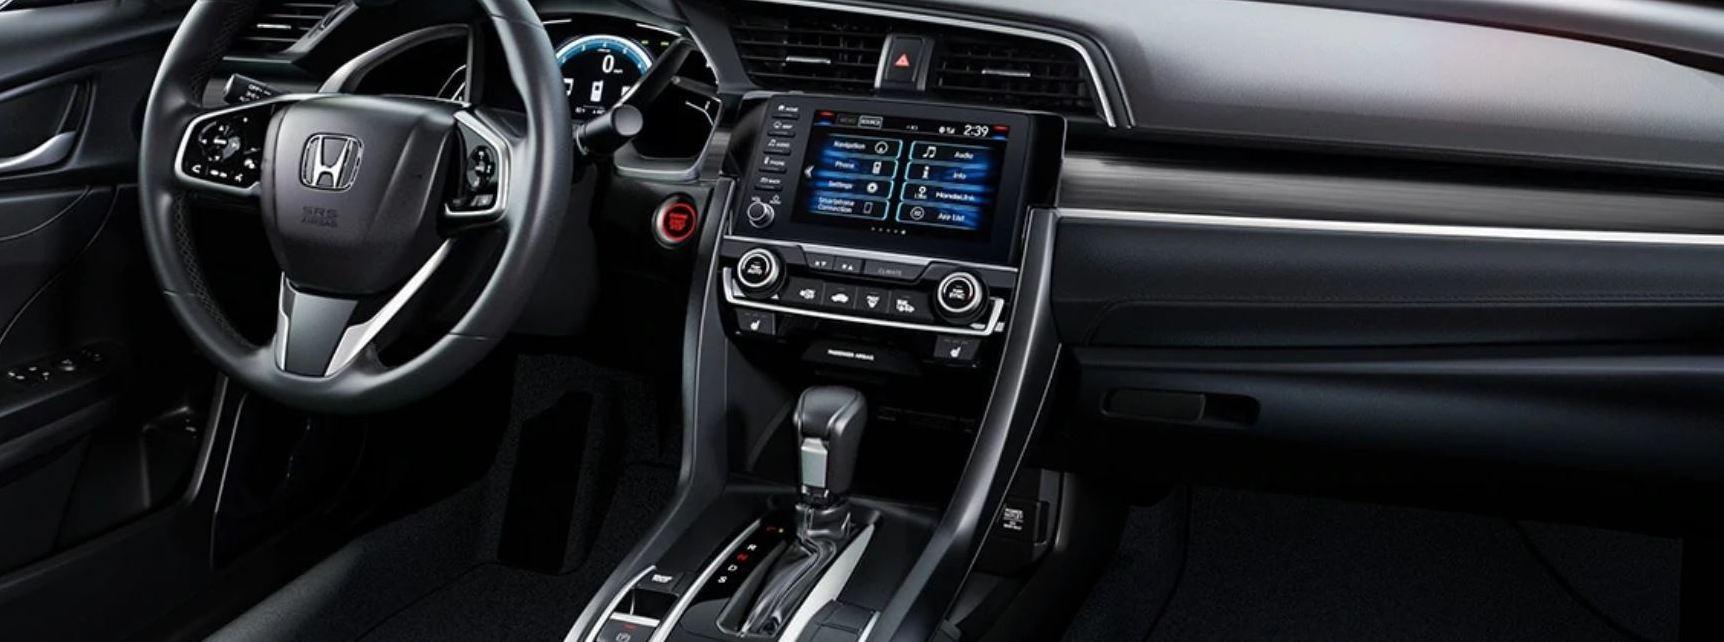 2020 Honda Civic Dashboard